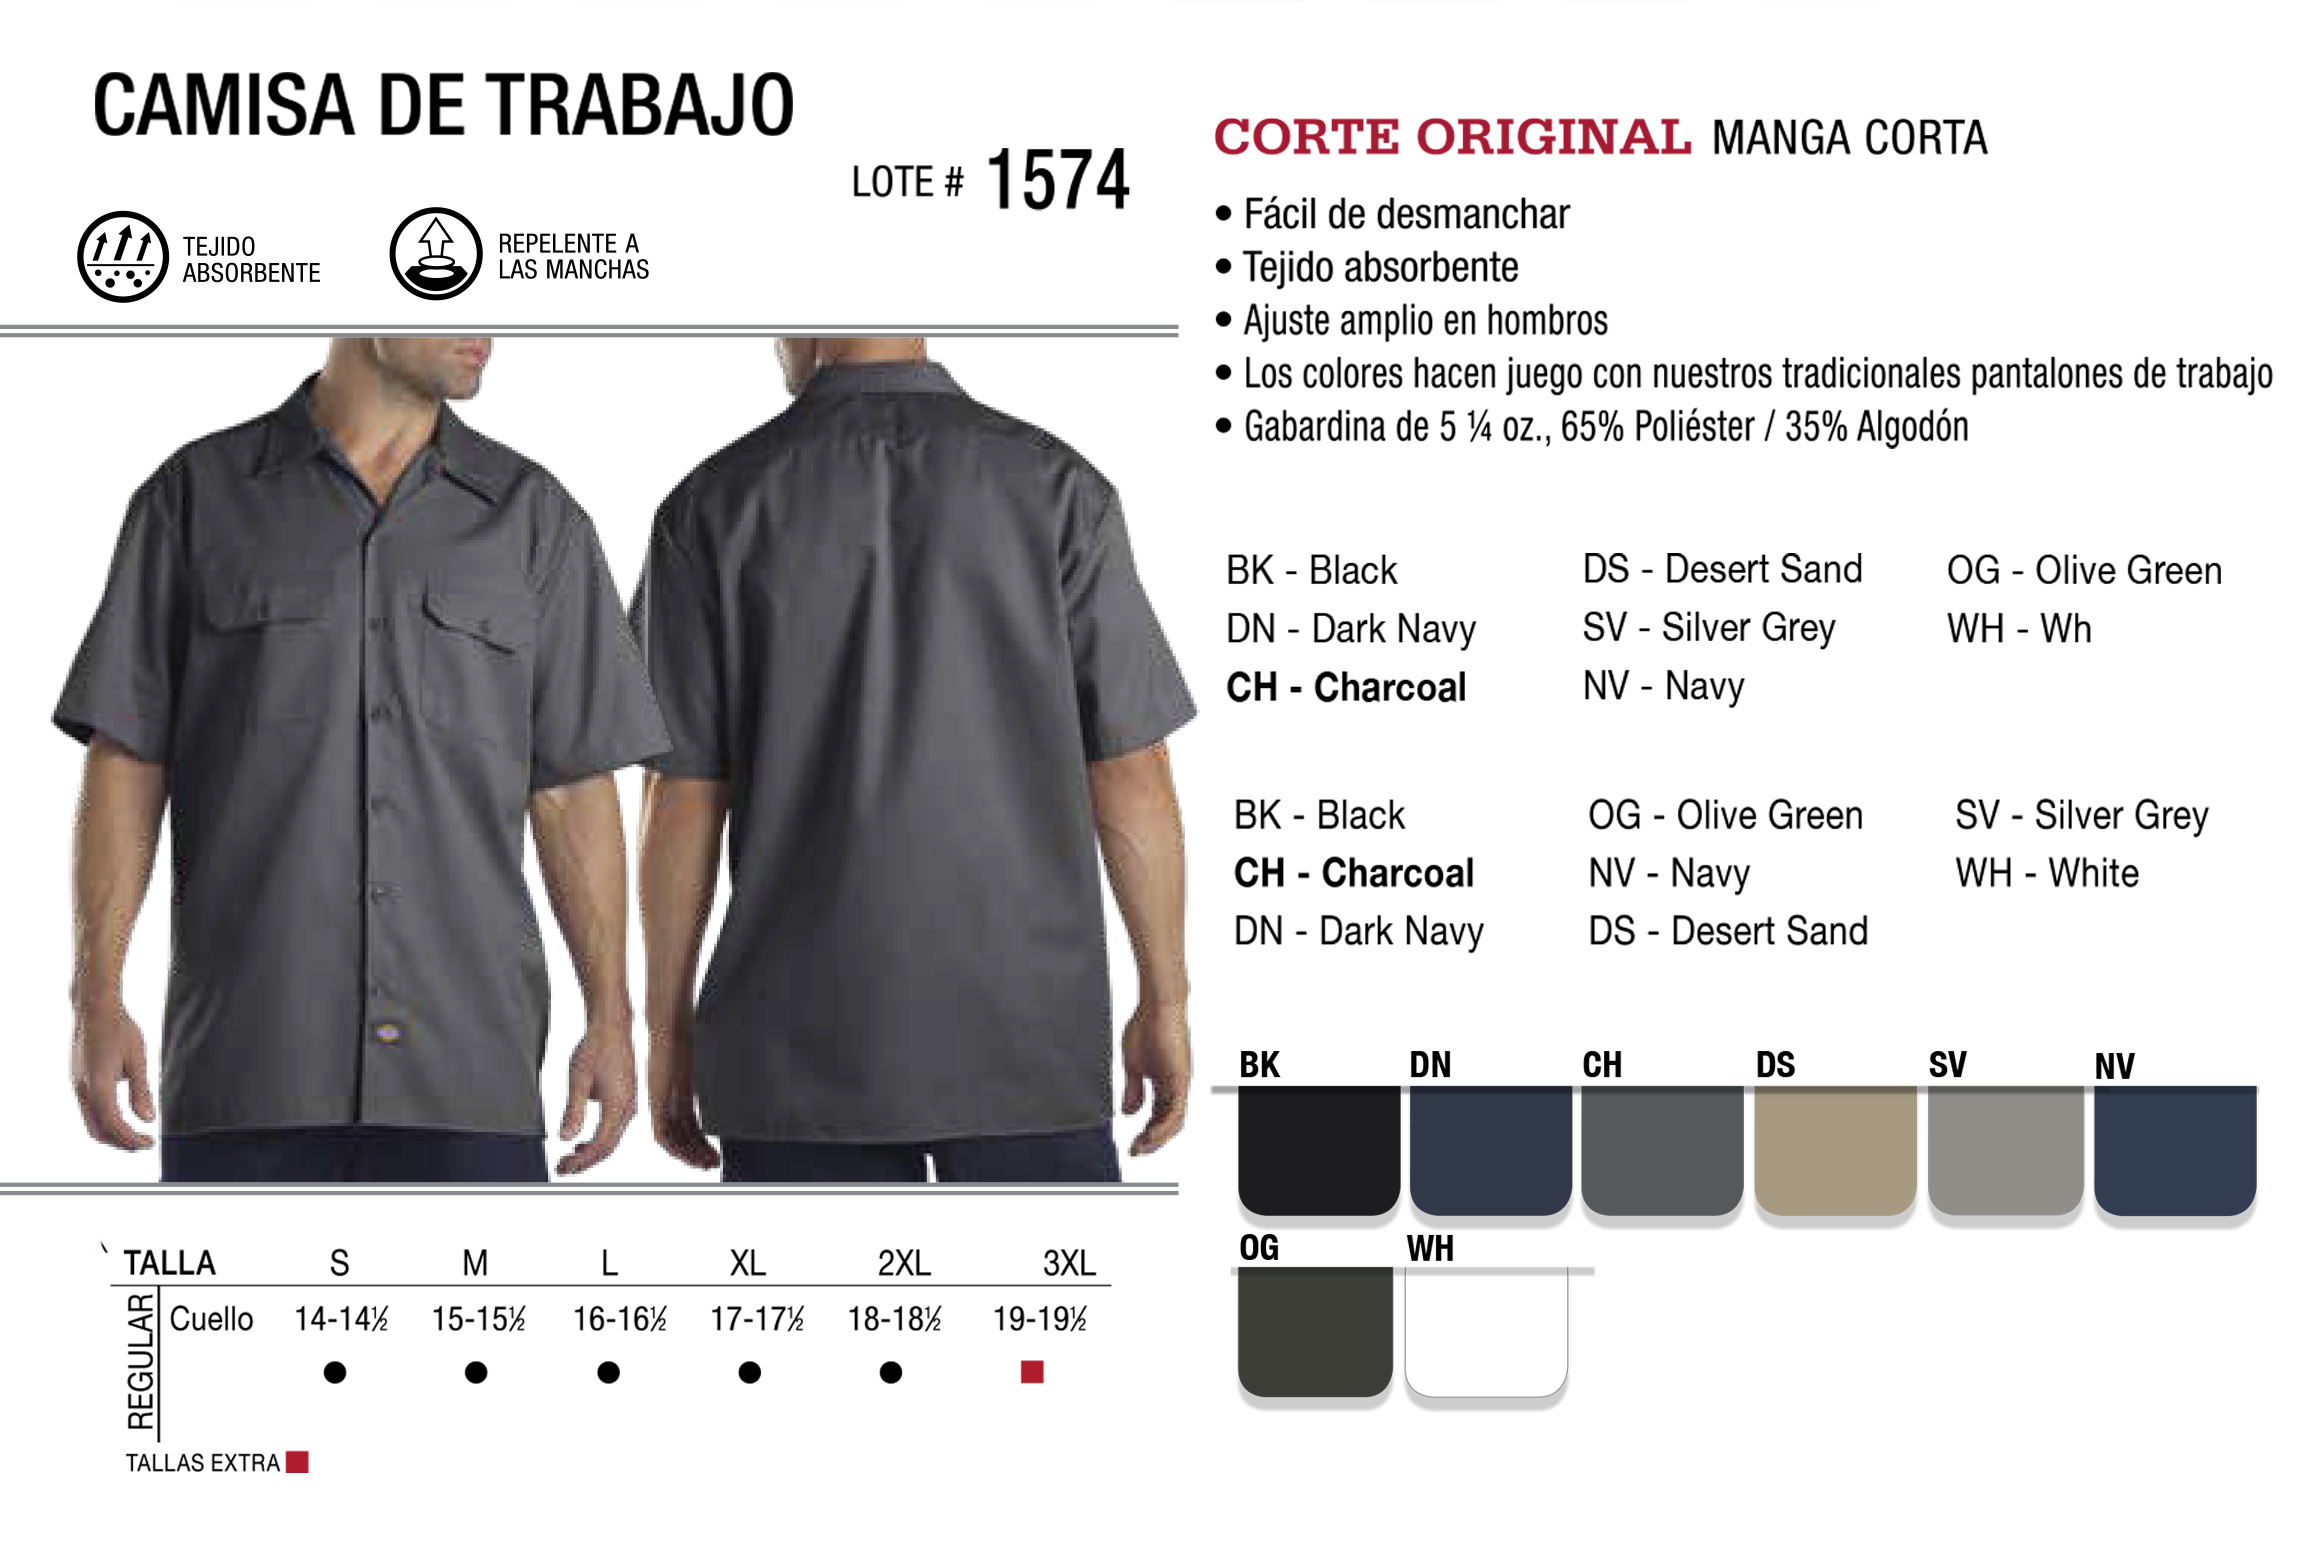 Camisa de trabajo. Manga corta. 1574